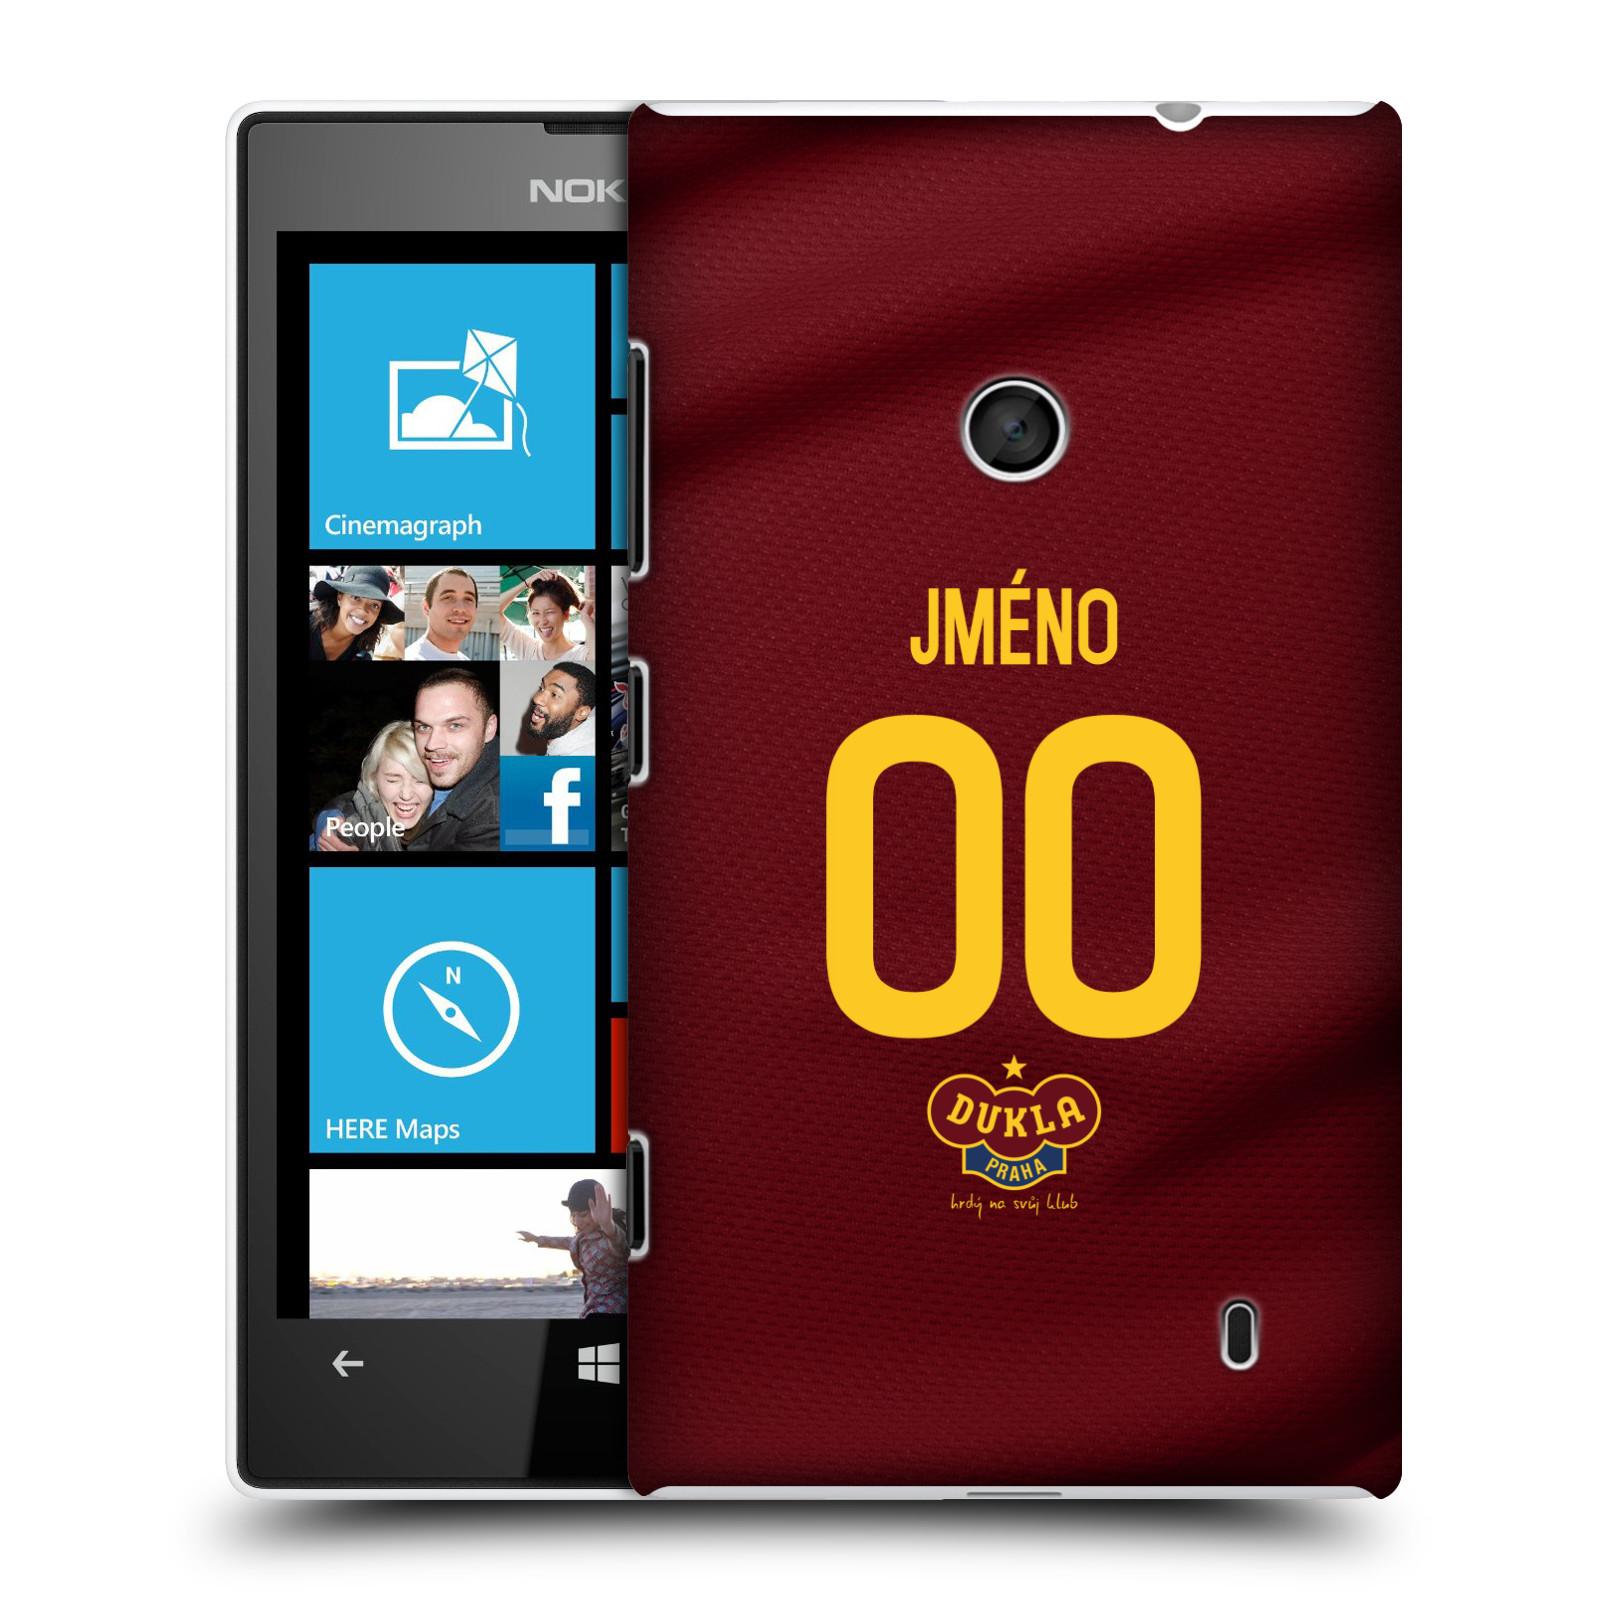 Plastové pouzdro na mobil Nokia Lumia 520 - FK Dukla Praha - dres s vlastním jménem a číslem